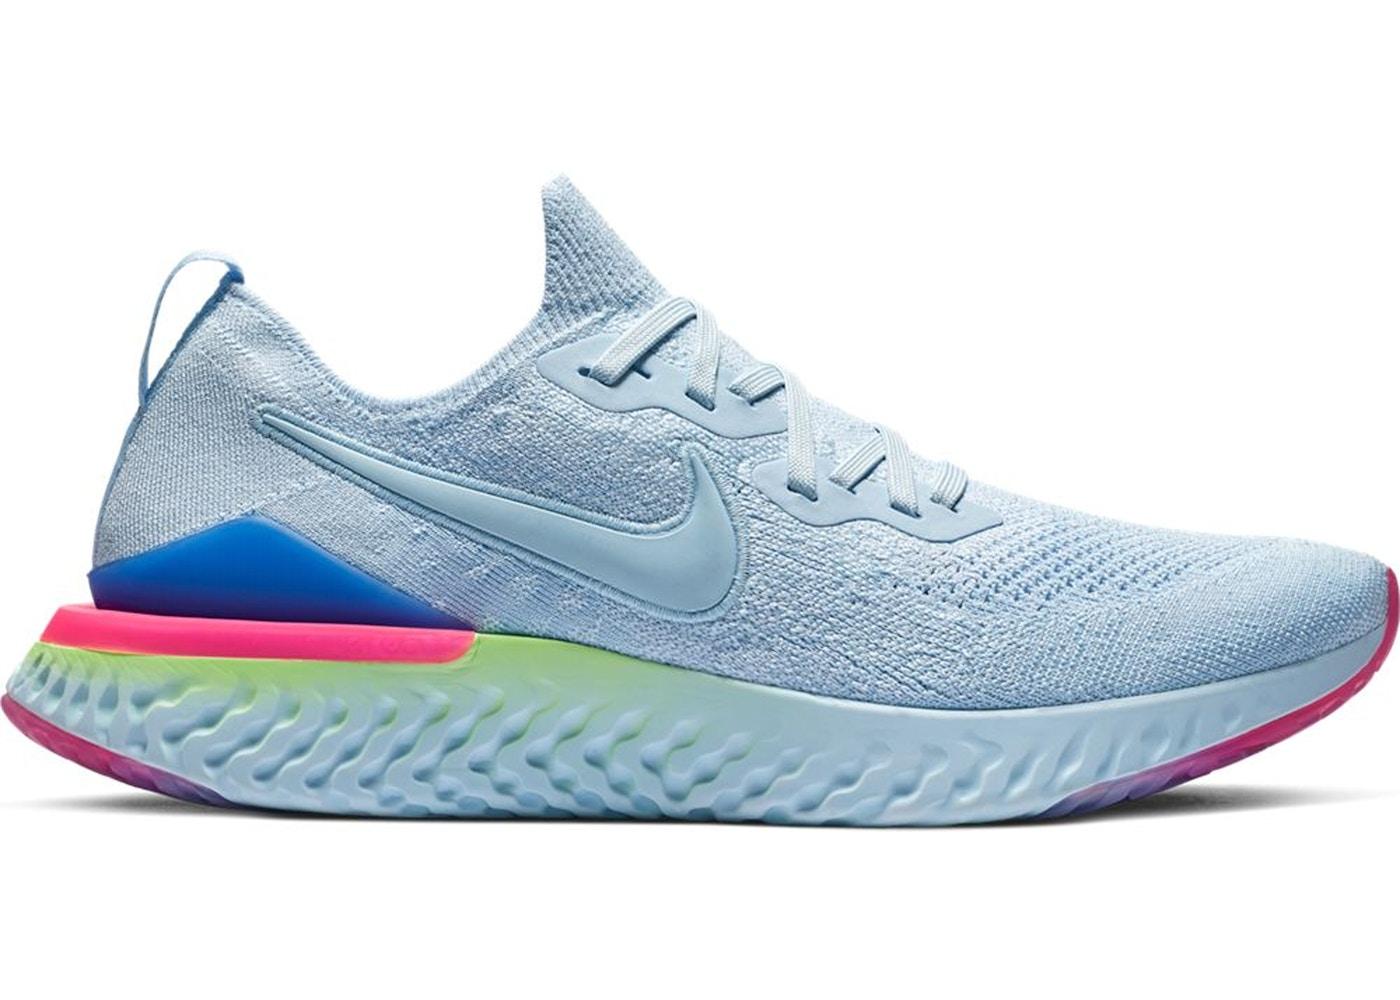 fbe3d8a041 Nike Epic React Flyknit 2 Hydrogen Blue Sapphire Hyper Pink - BQ8928-453